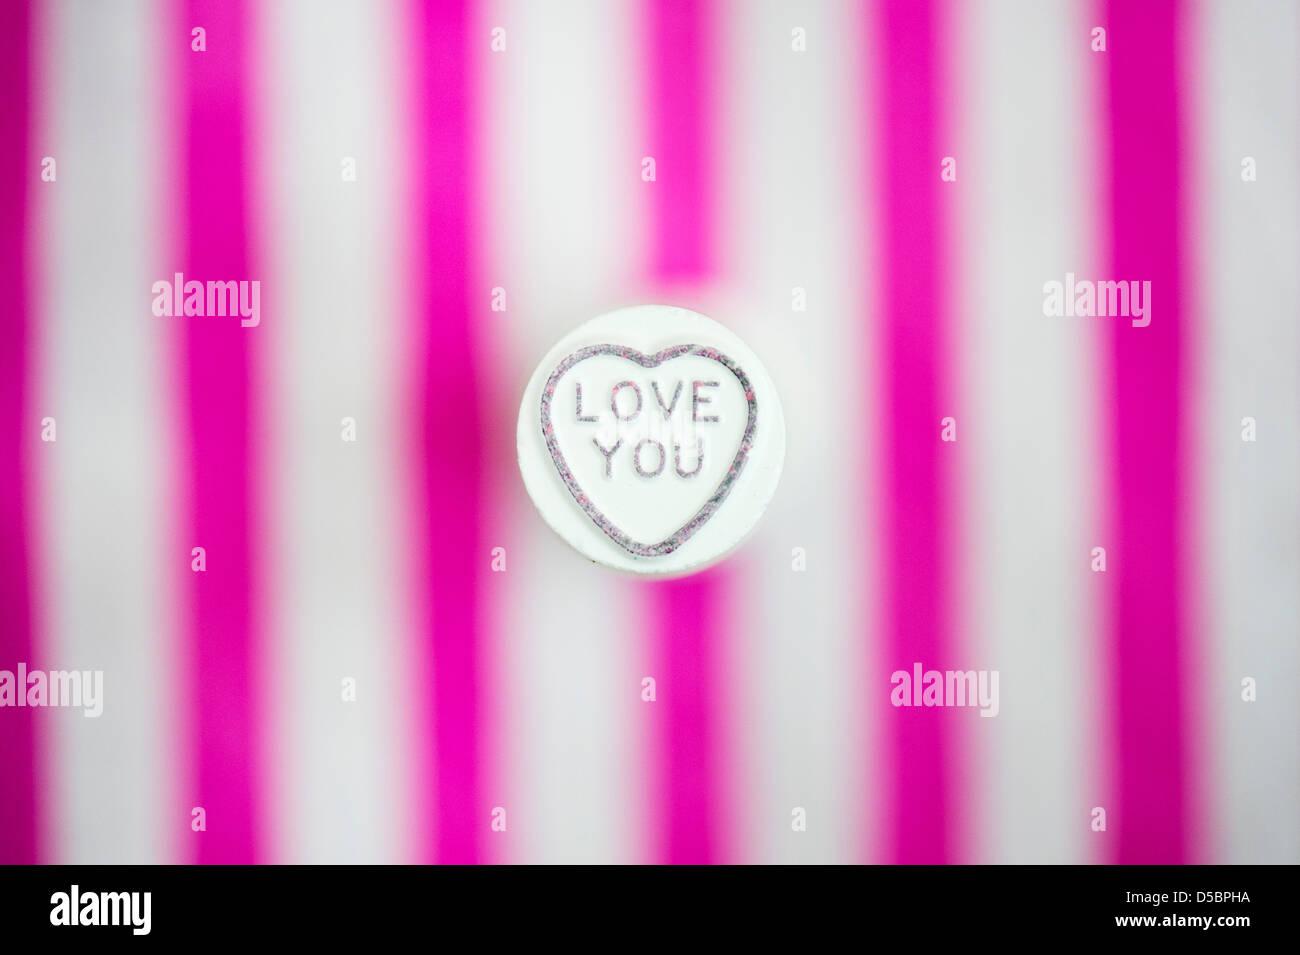 Liebe dich. Liebe Herz. Retro-süße Muster Stockbild